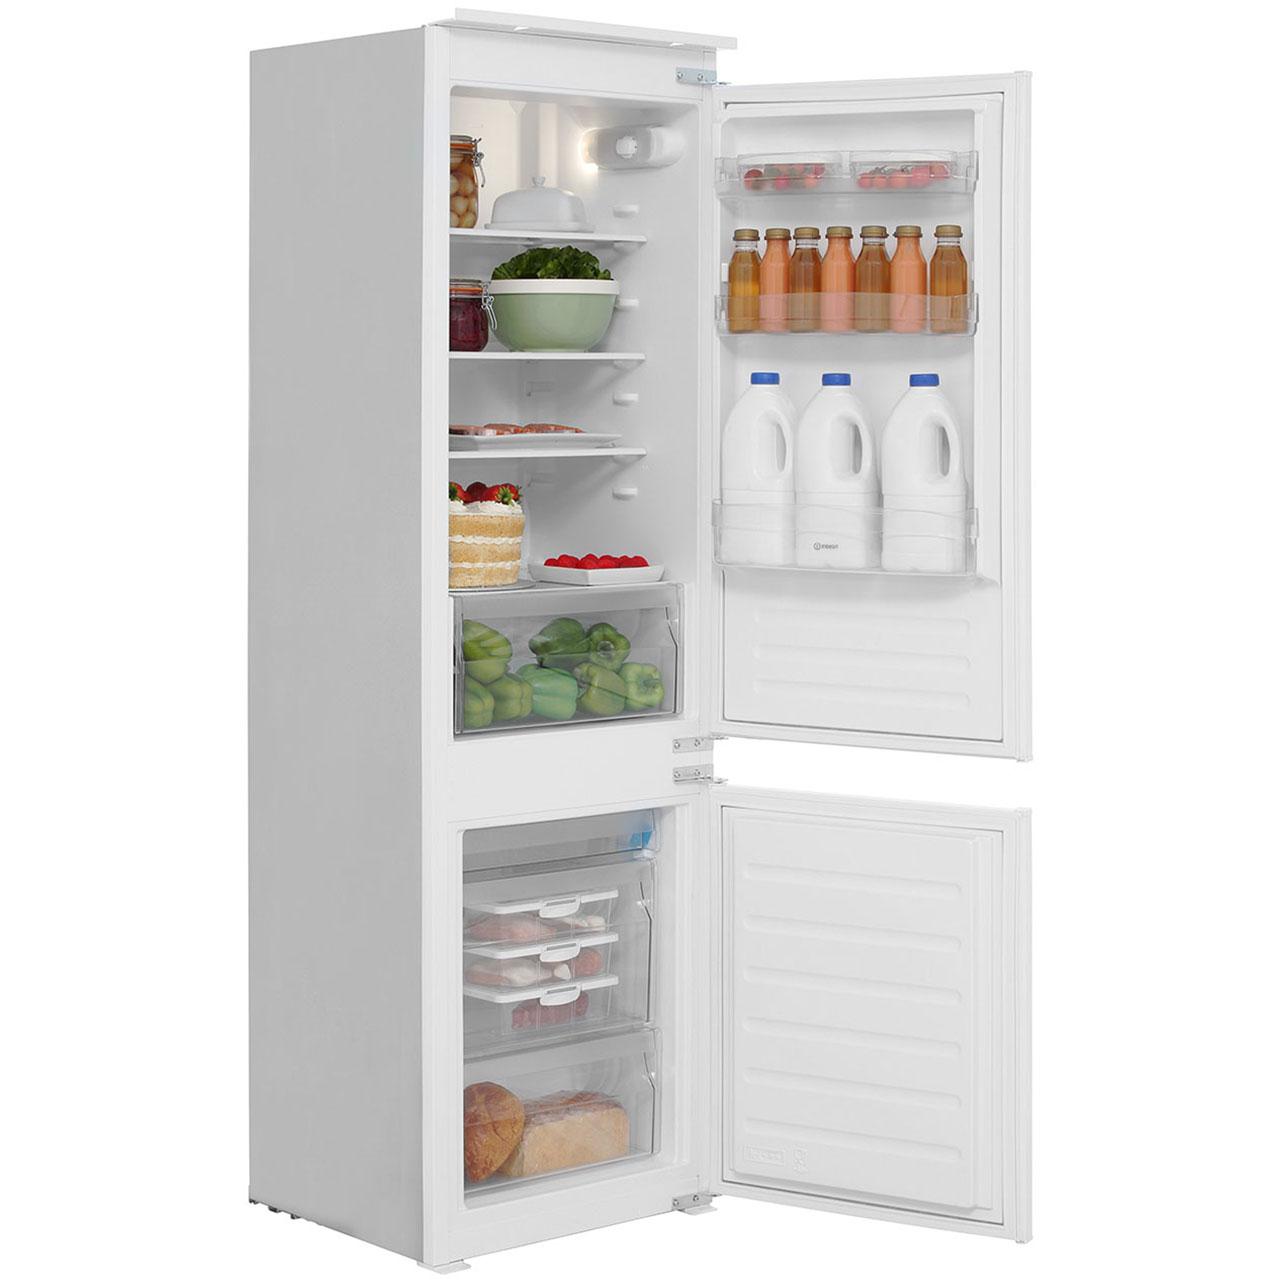 integrated indesit fridge shop for cheap freezers and. Black Bedroom Furniture Sets. Home Design Ideas